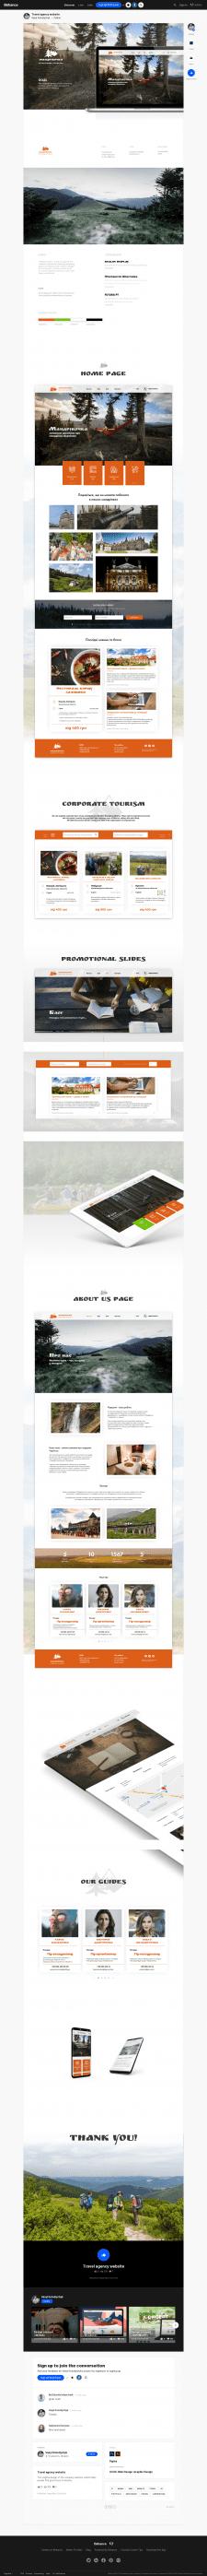 Travel-agency-website